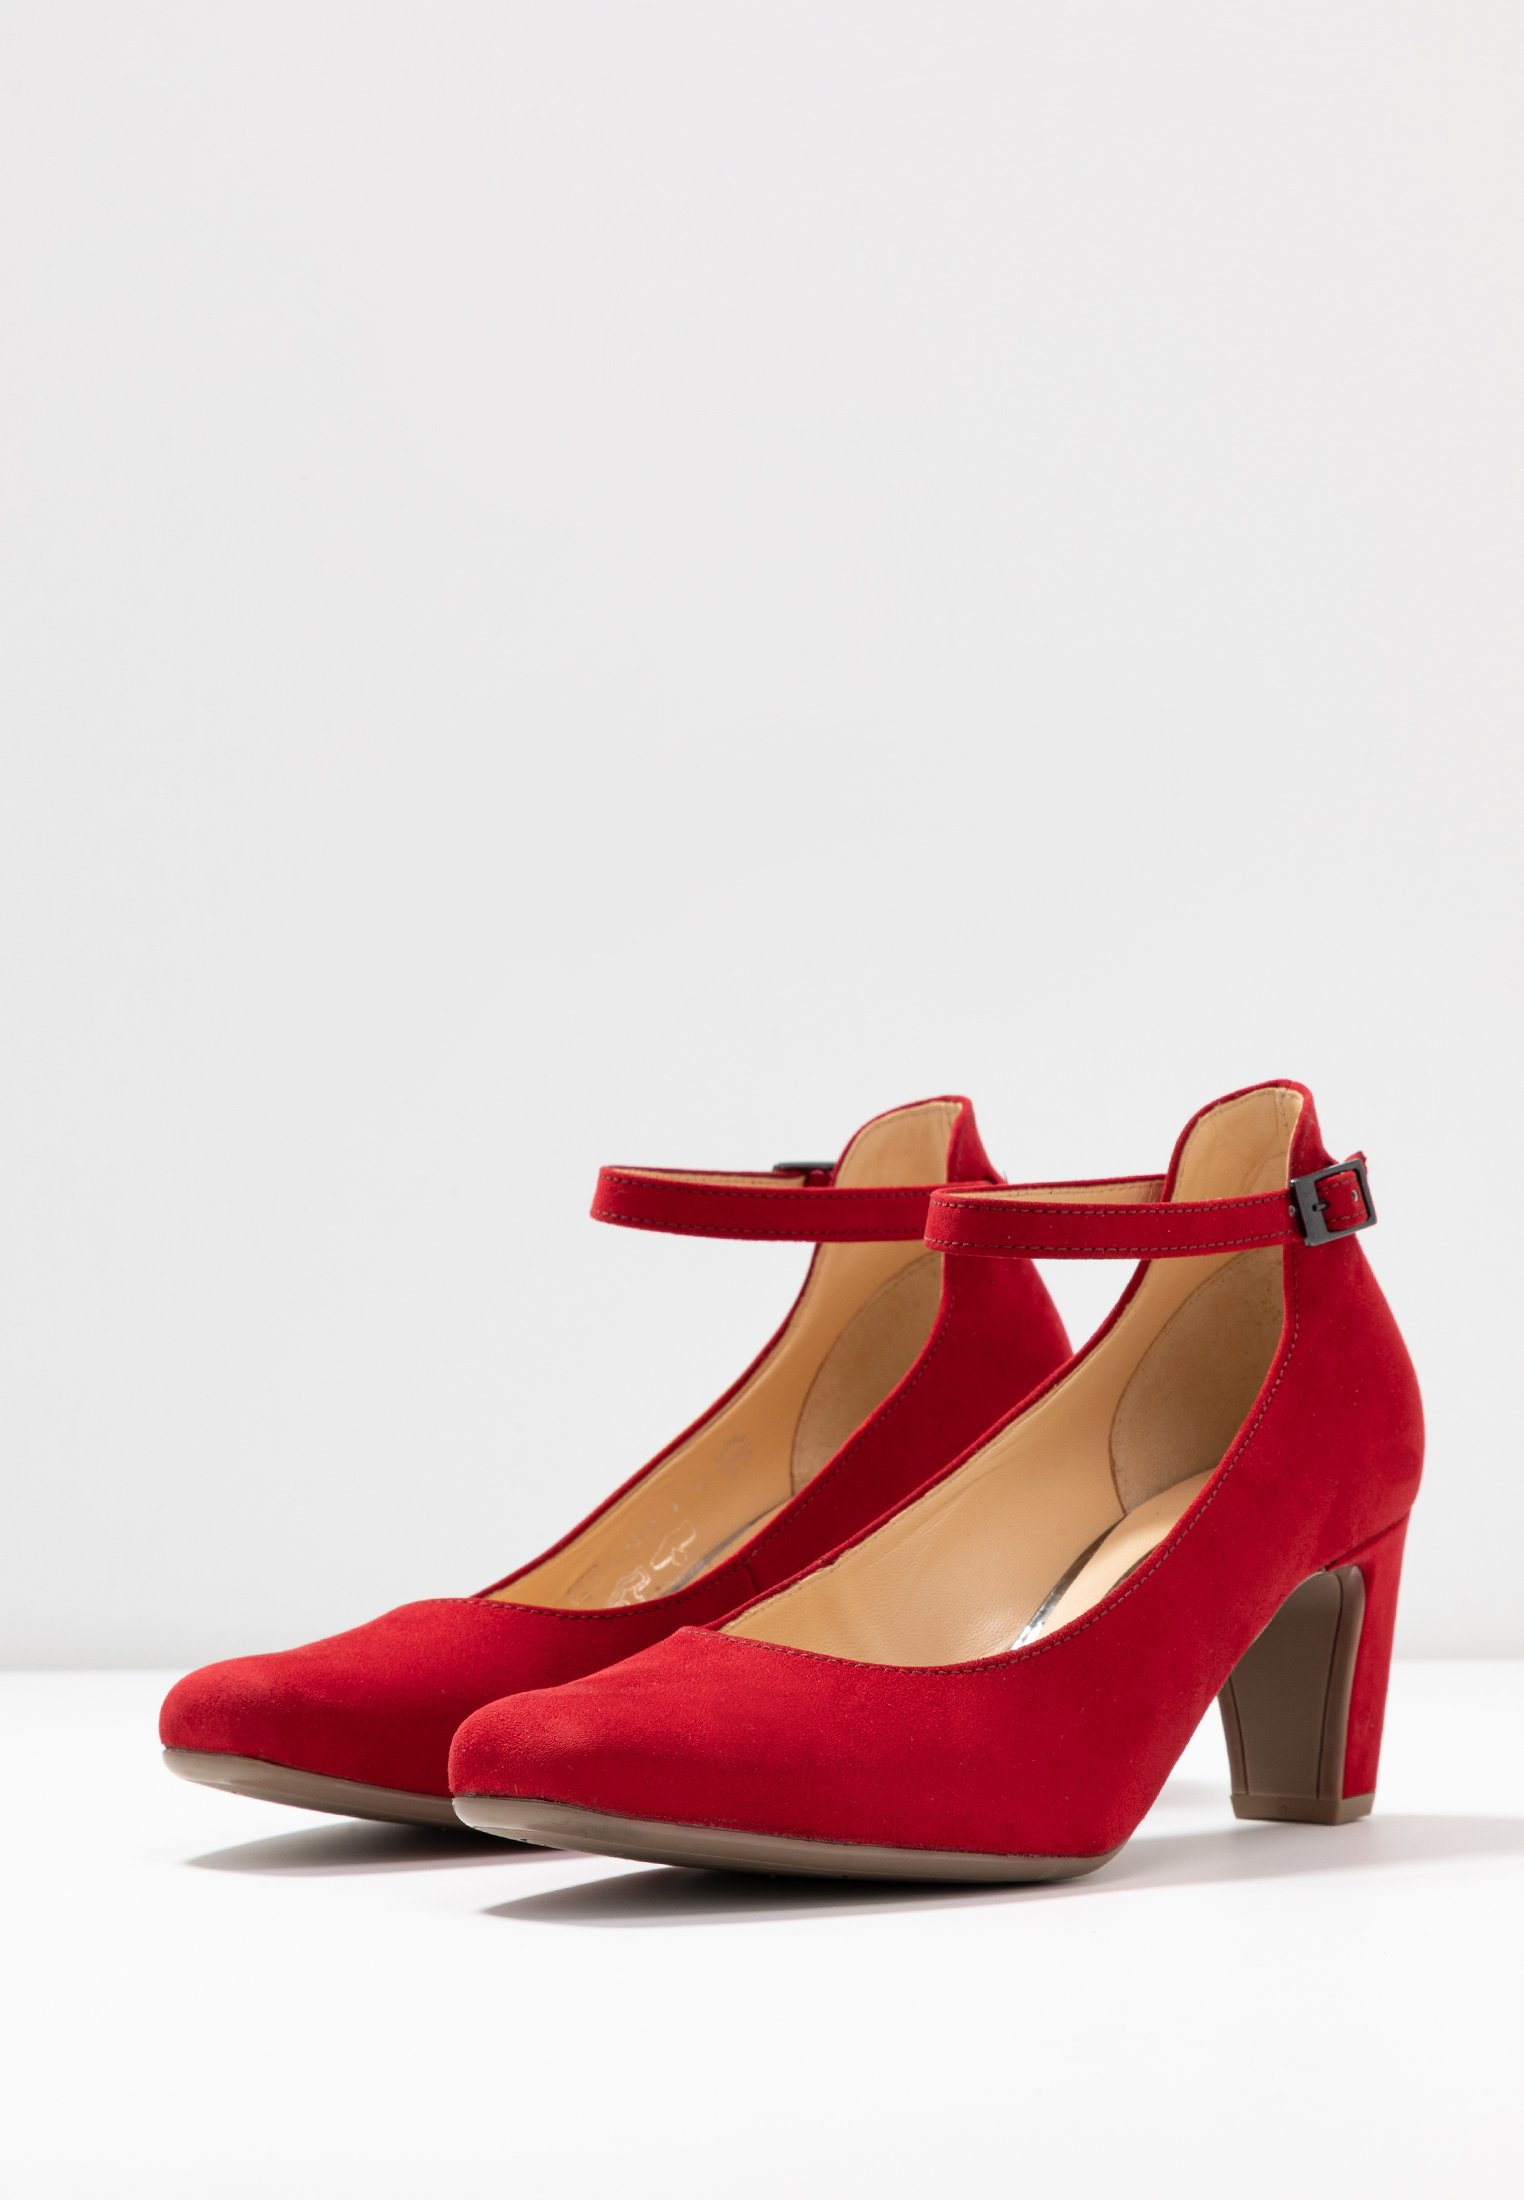 Gabor Classic heels - cherry